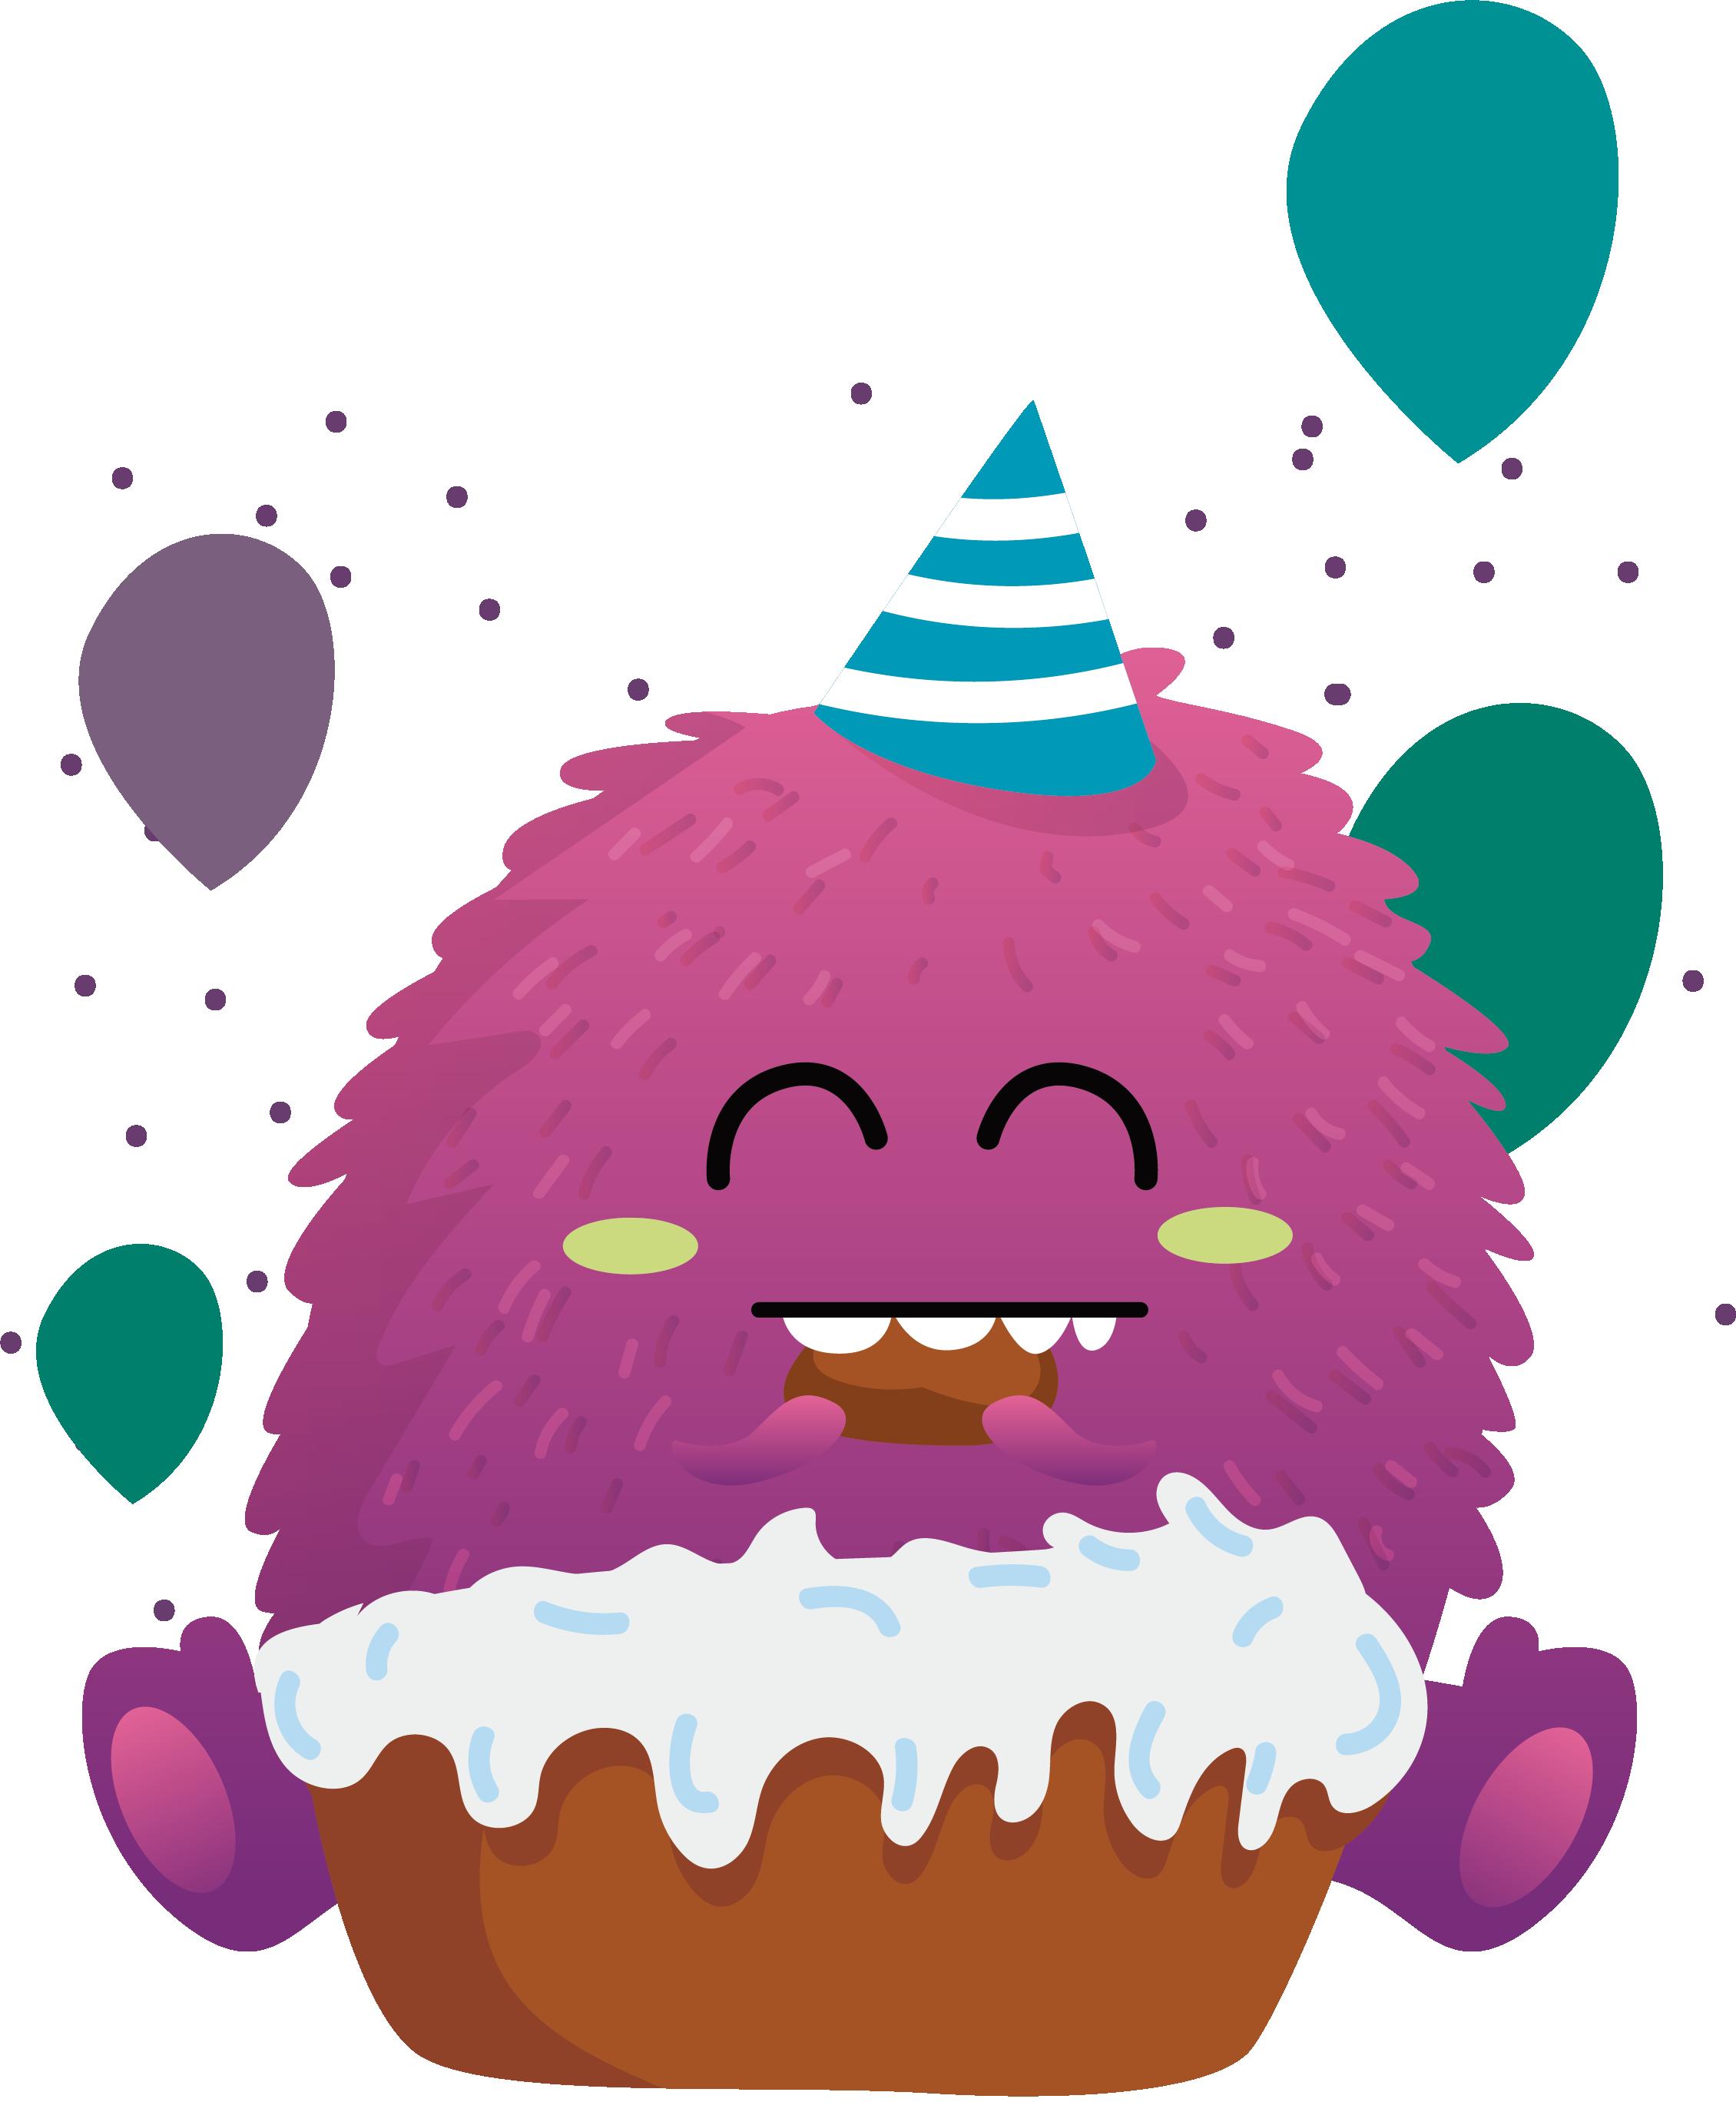 Cupcake clipart monster. Fruitcake birthday cake bxe